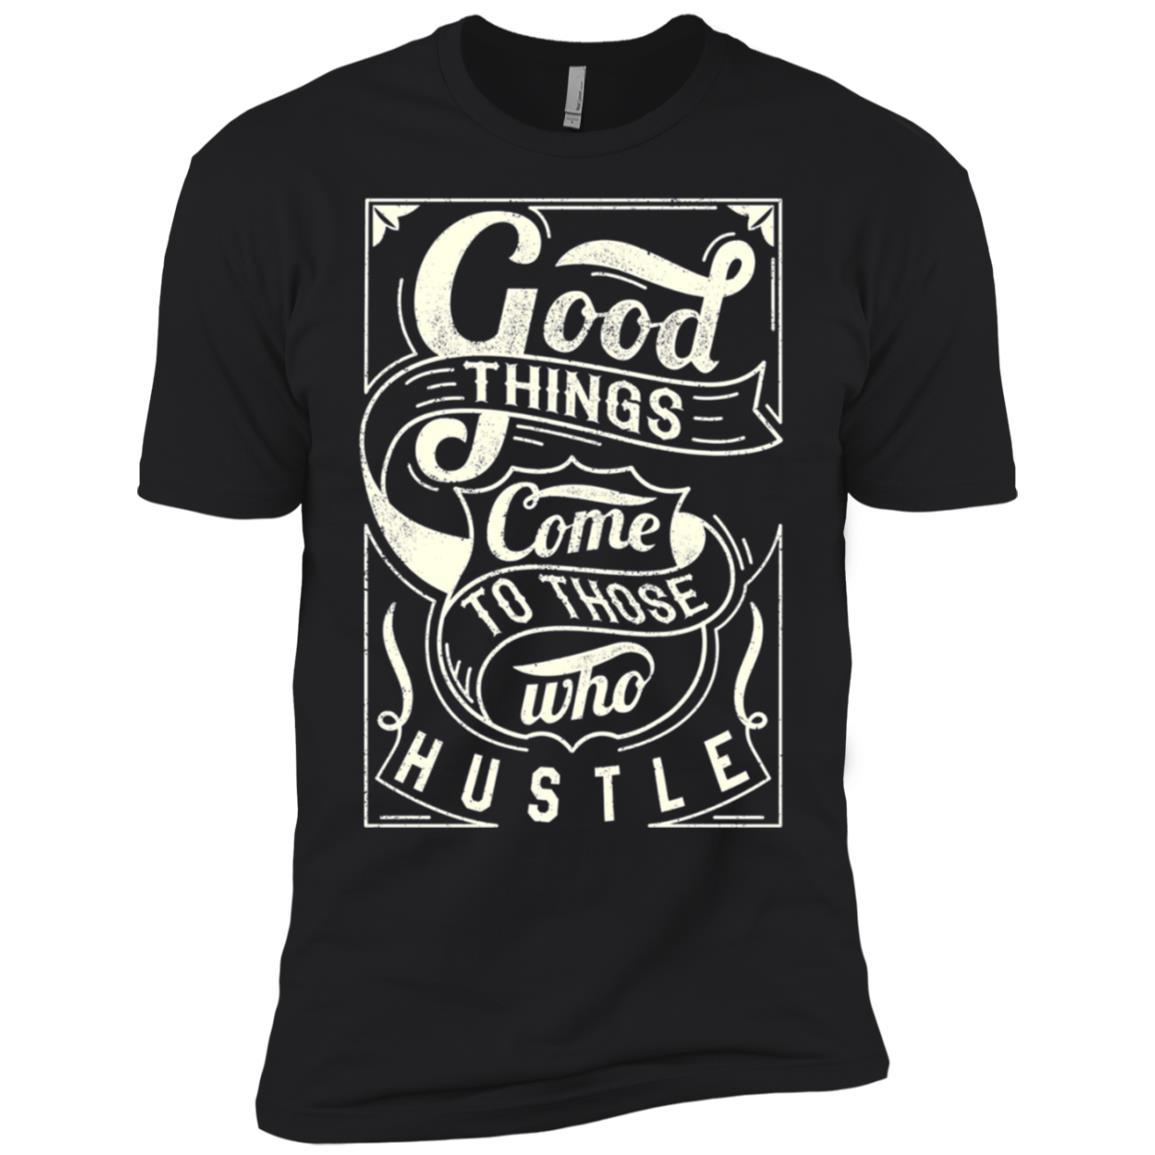 Good Things come to those who hustle Men Women Men Short Sleeve T-Shirt